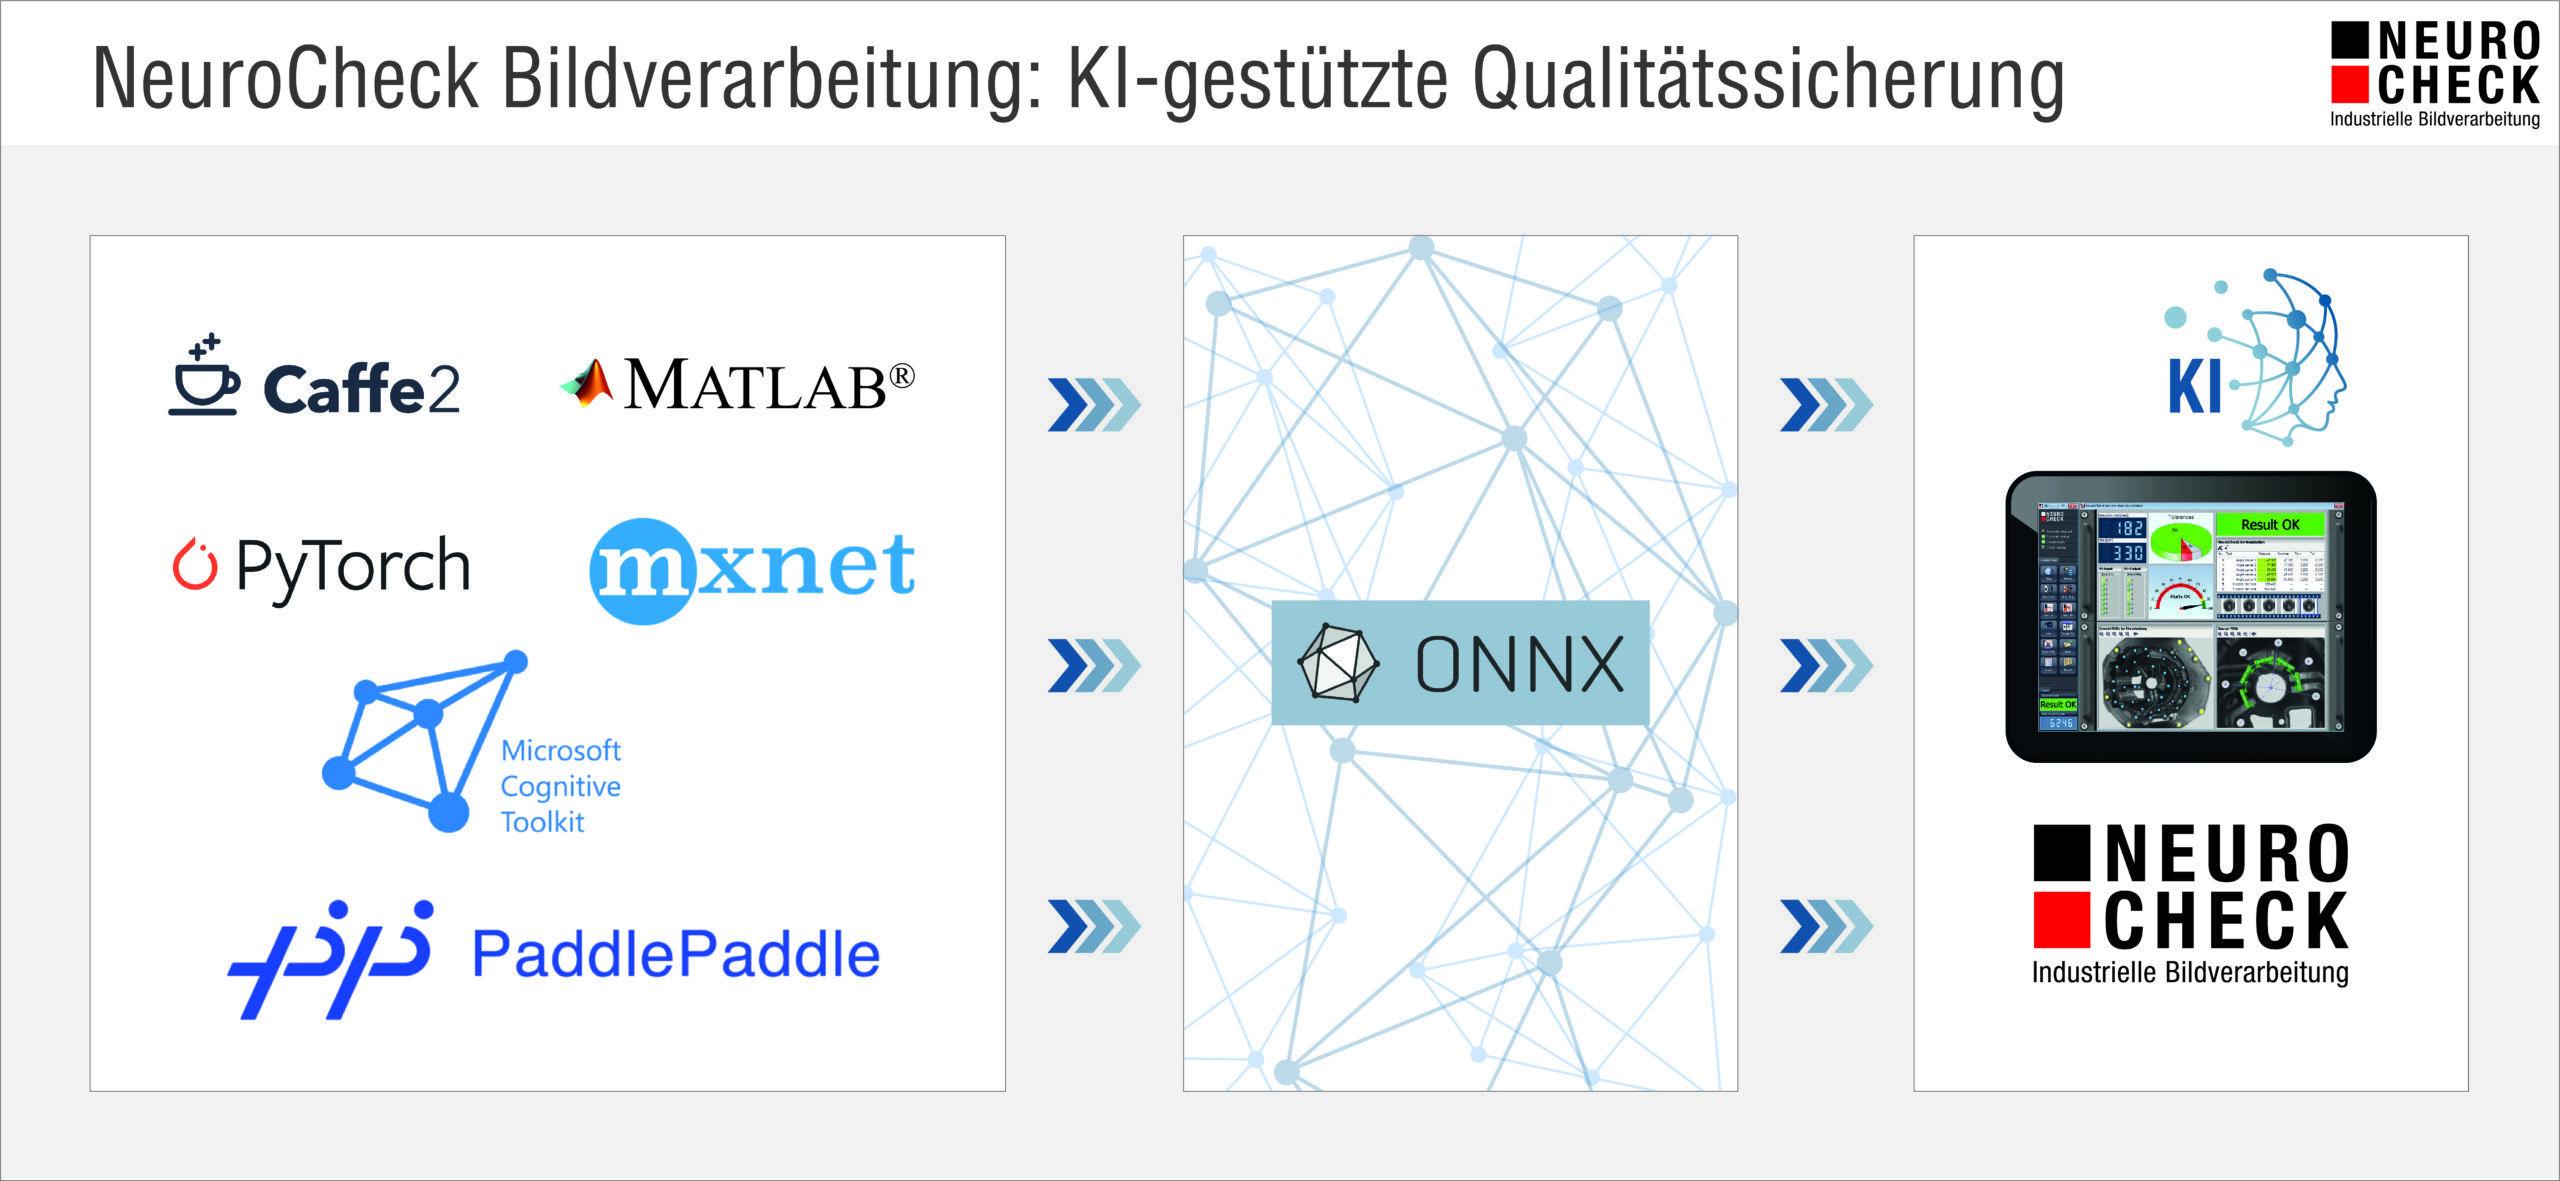 NeuroCheck KI-Xtension ONNX Support New Release (Foto © NeuroCheck)